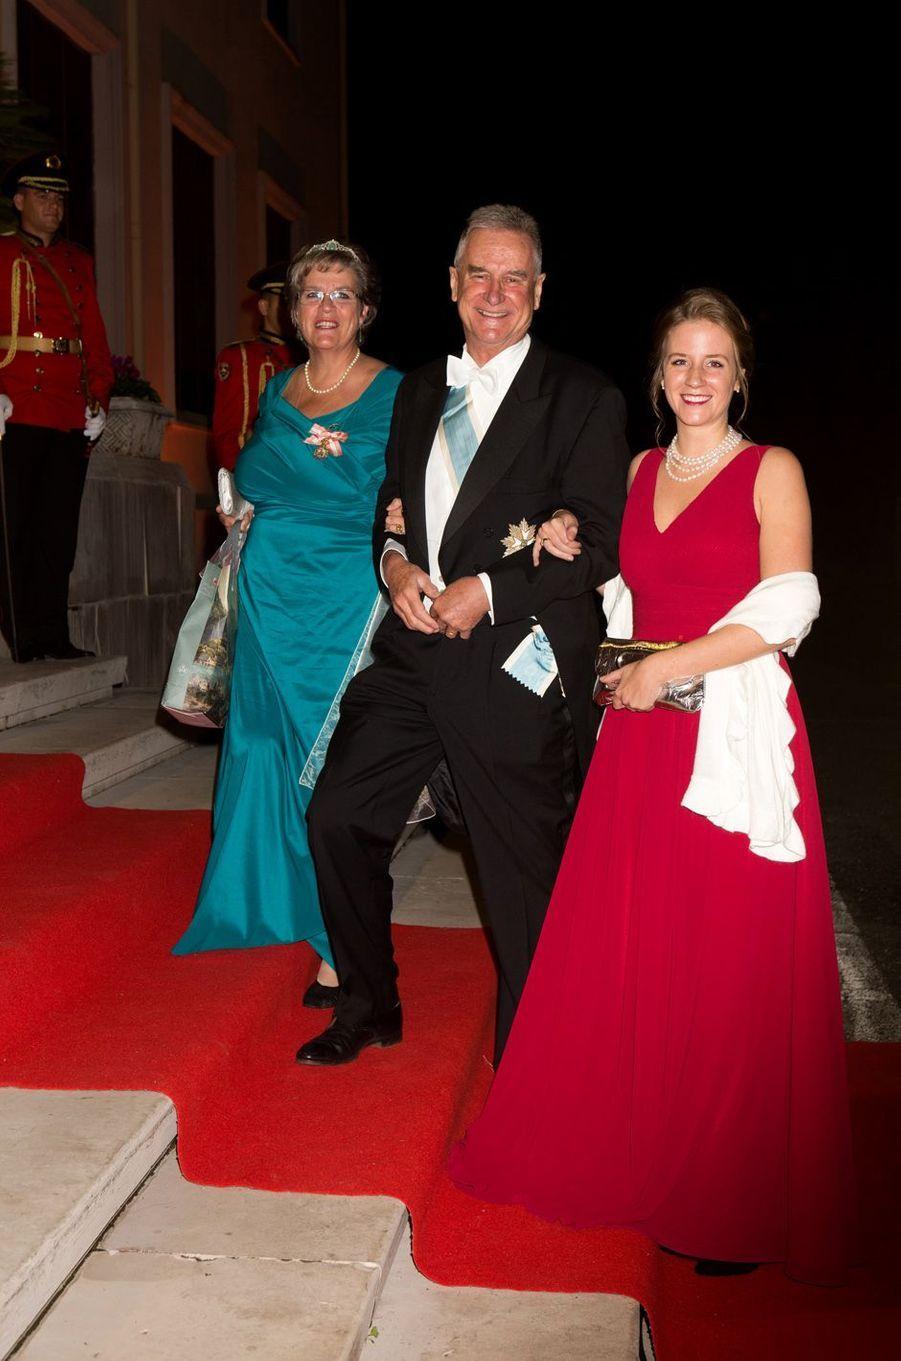 Le prince Gundakar de Liechtenstein, la princesse Marie de Liechtenstein et leur fille la princesse Léopoldine